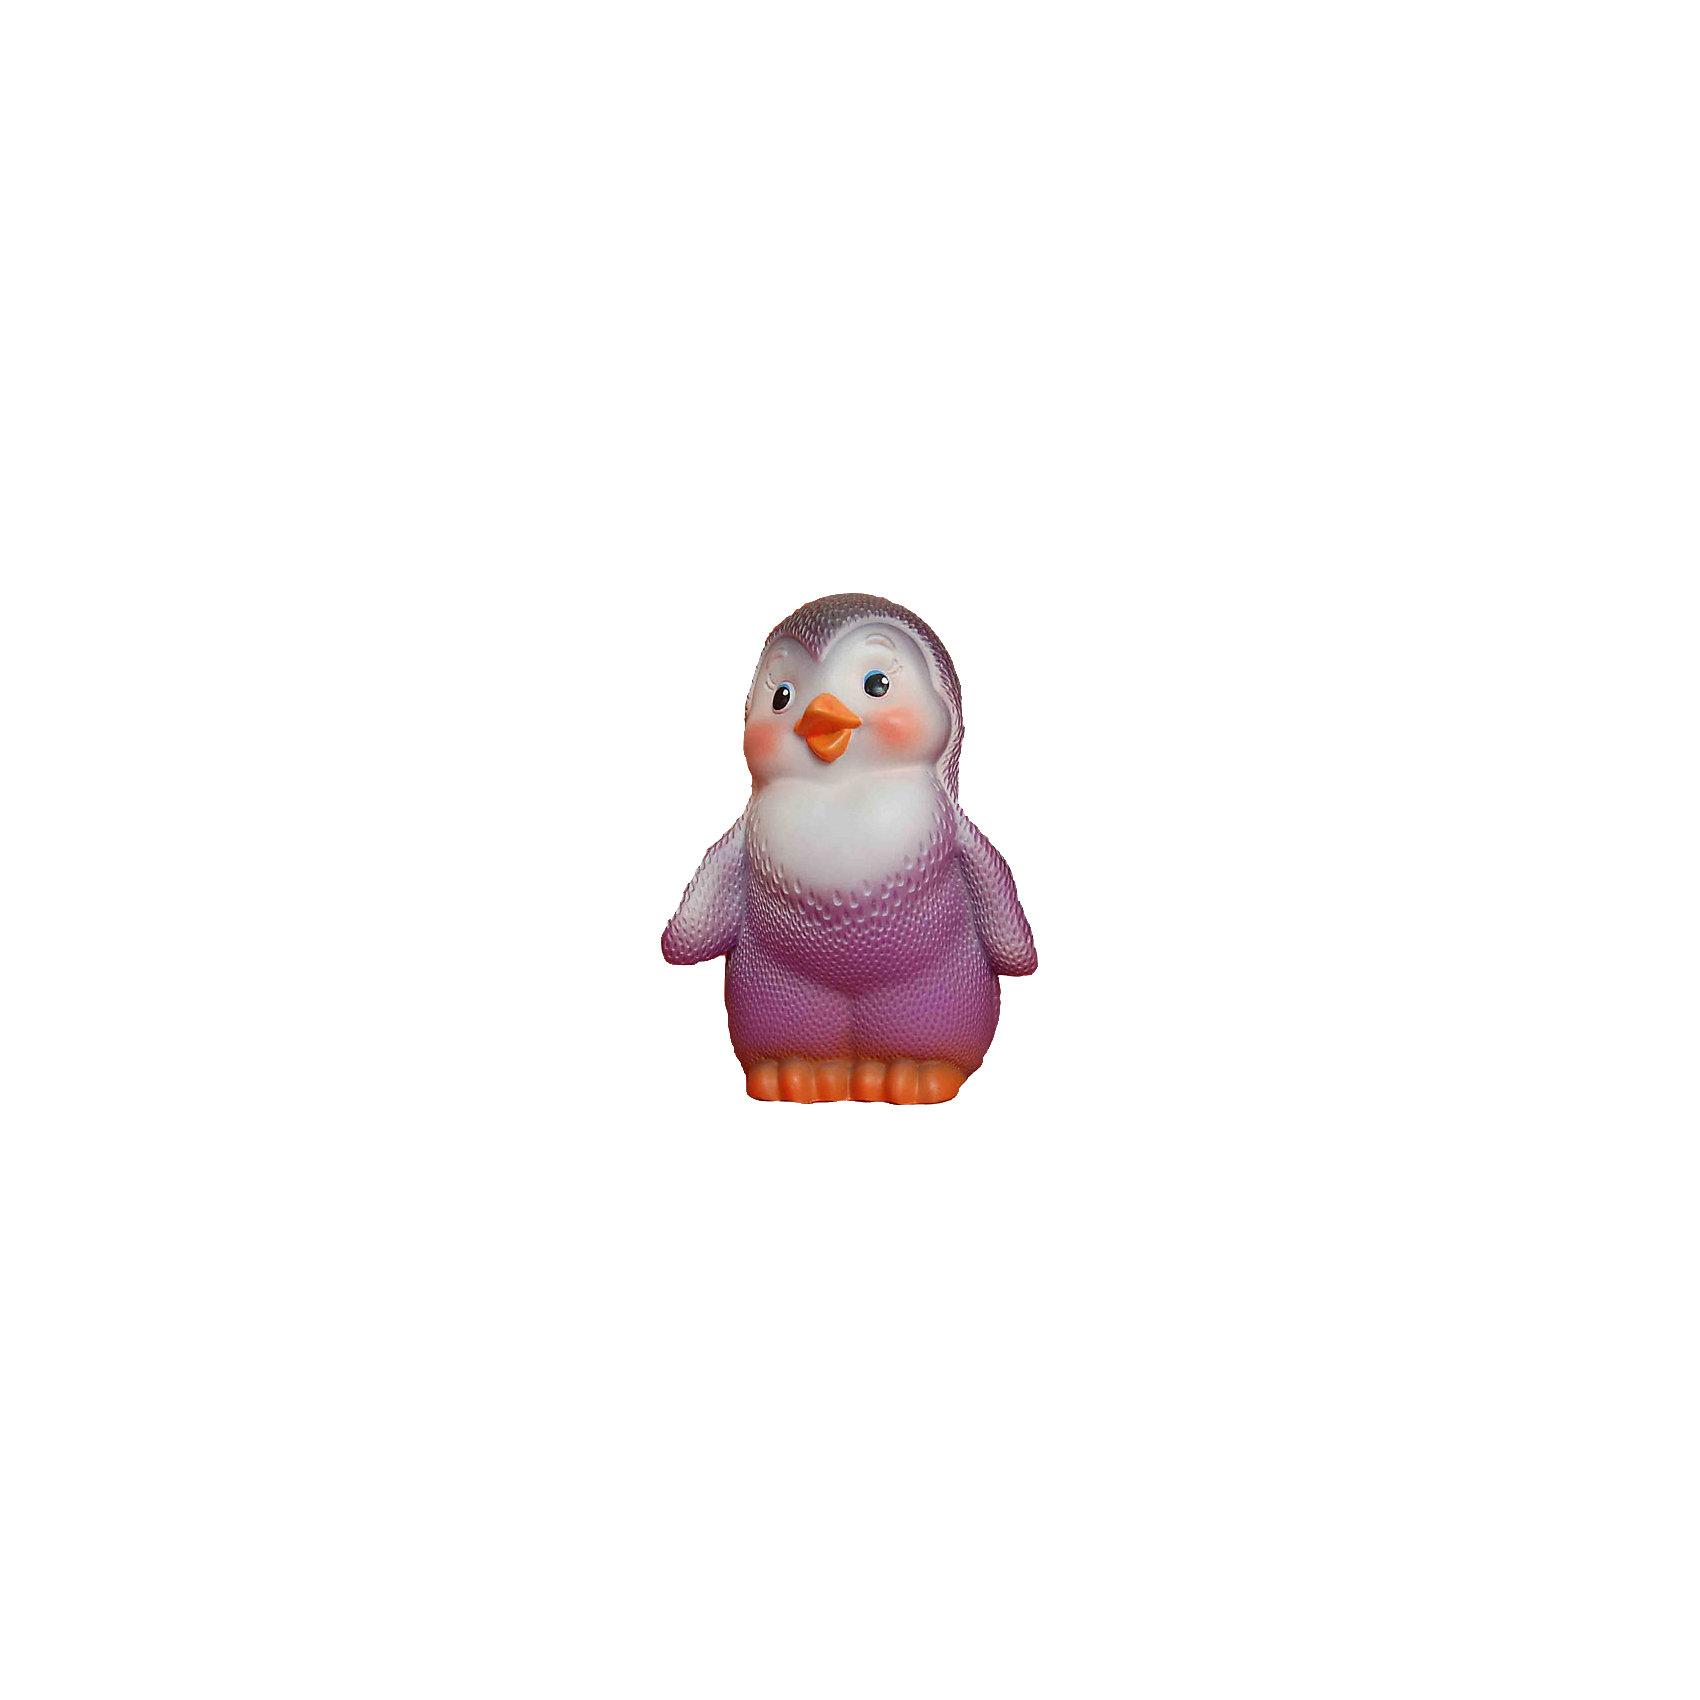 Пингвиненок Лоло, Огонек